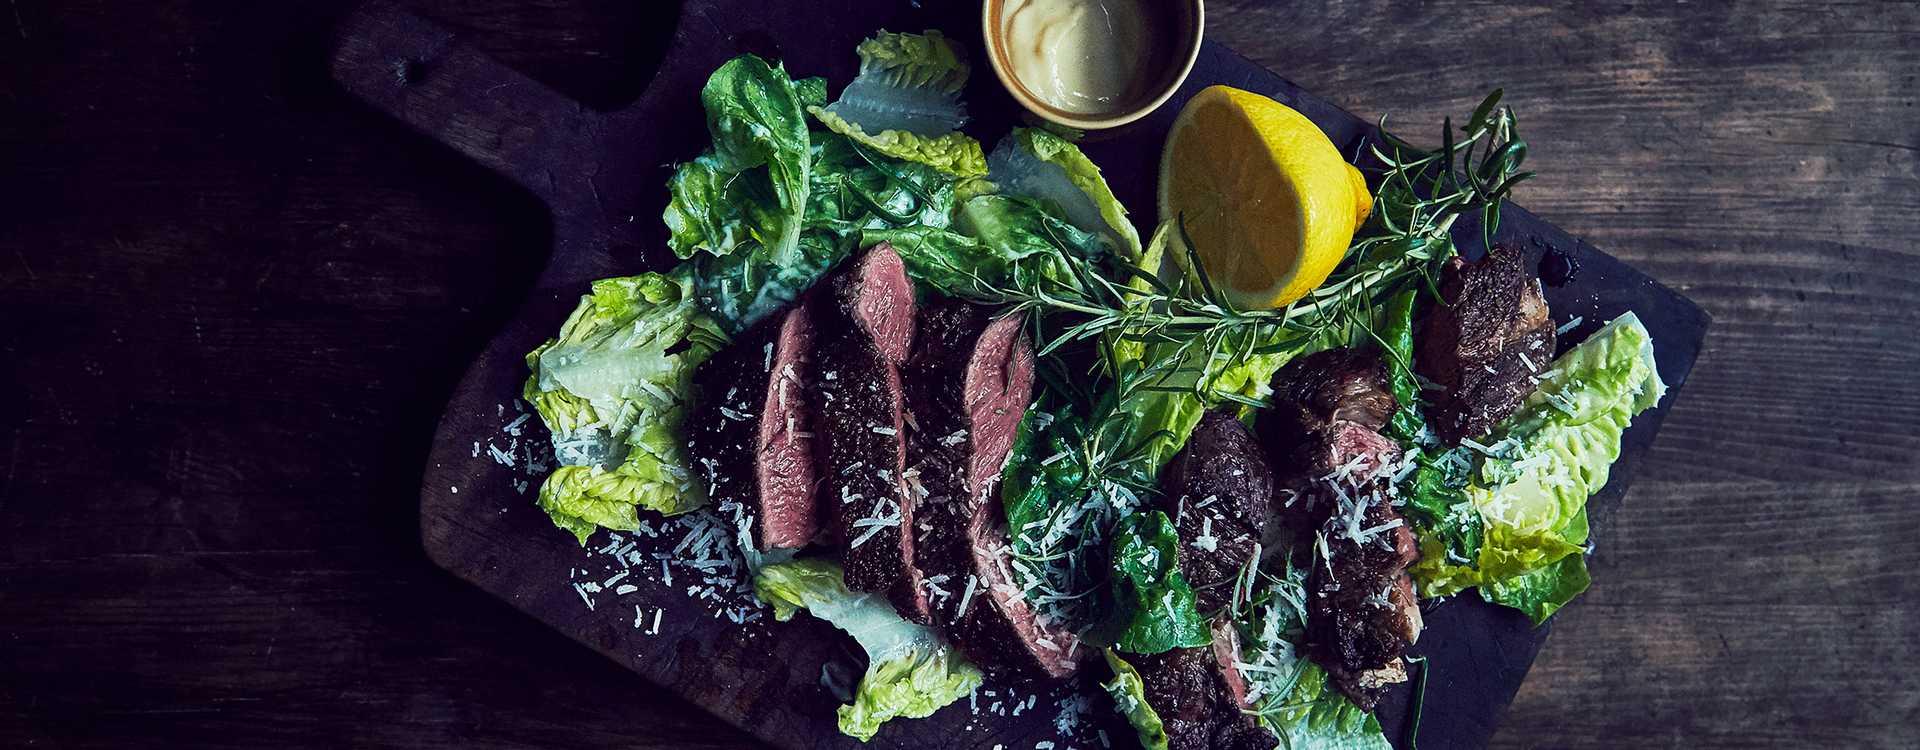 Tagliata på høyrygg med hjertesalat parmesan og aioli